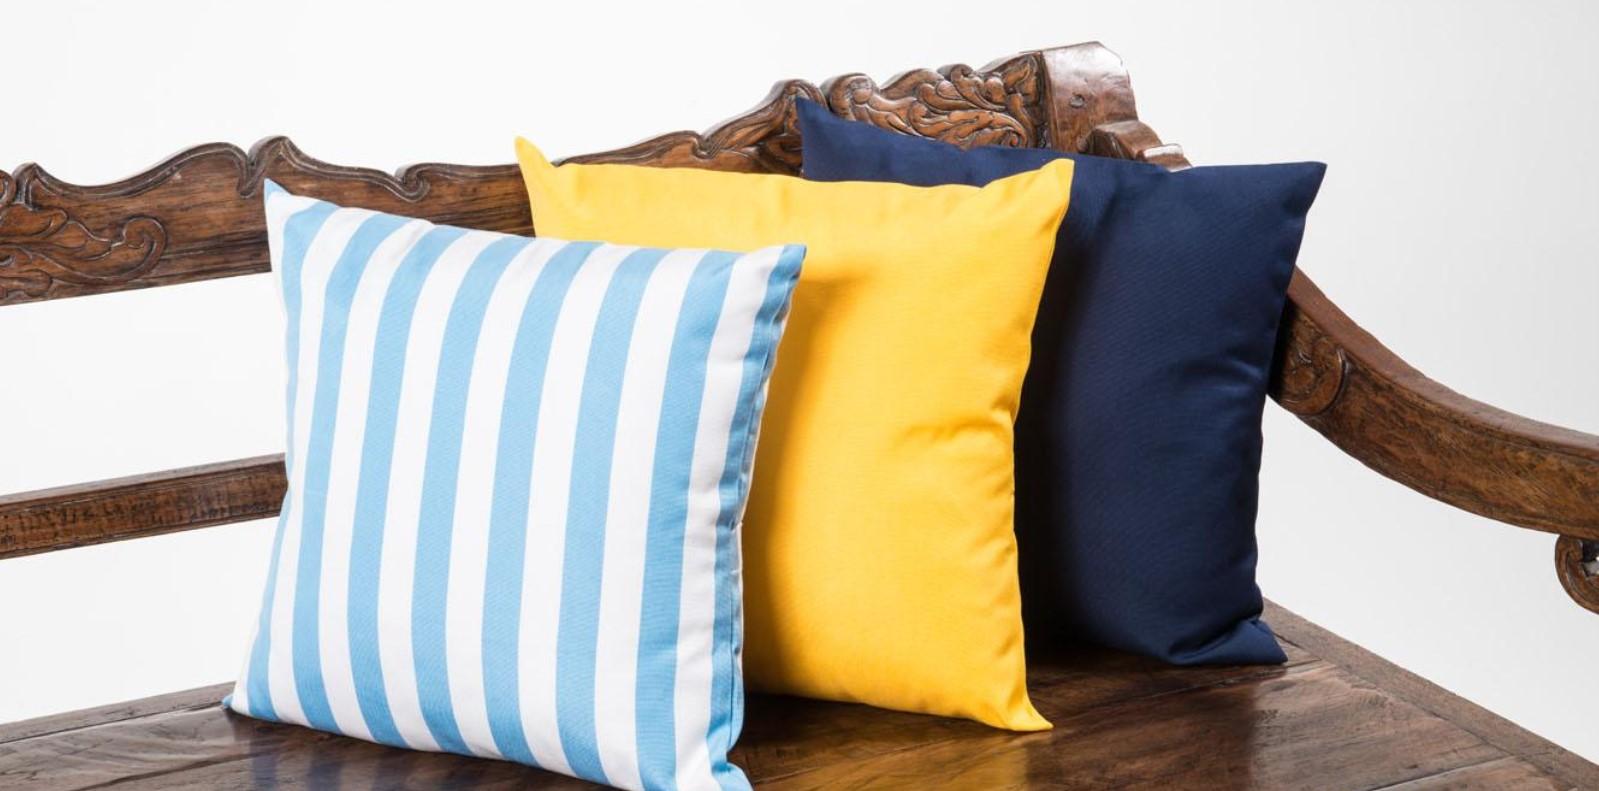 Find the Cheap Custom Made Cushions